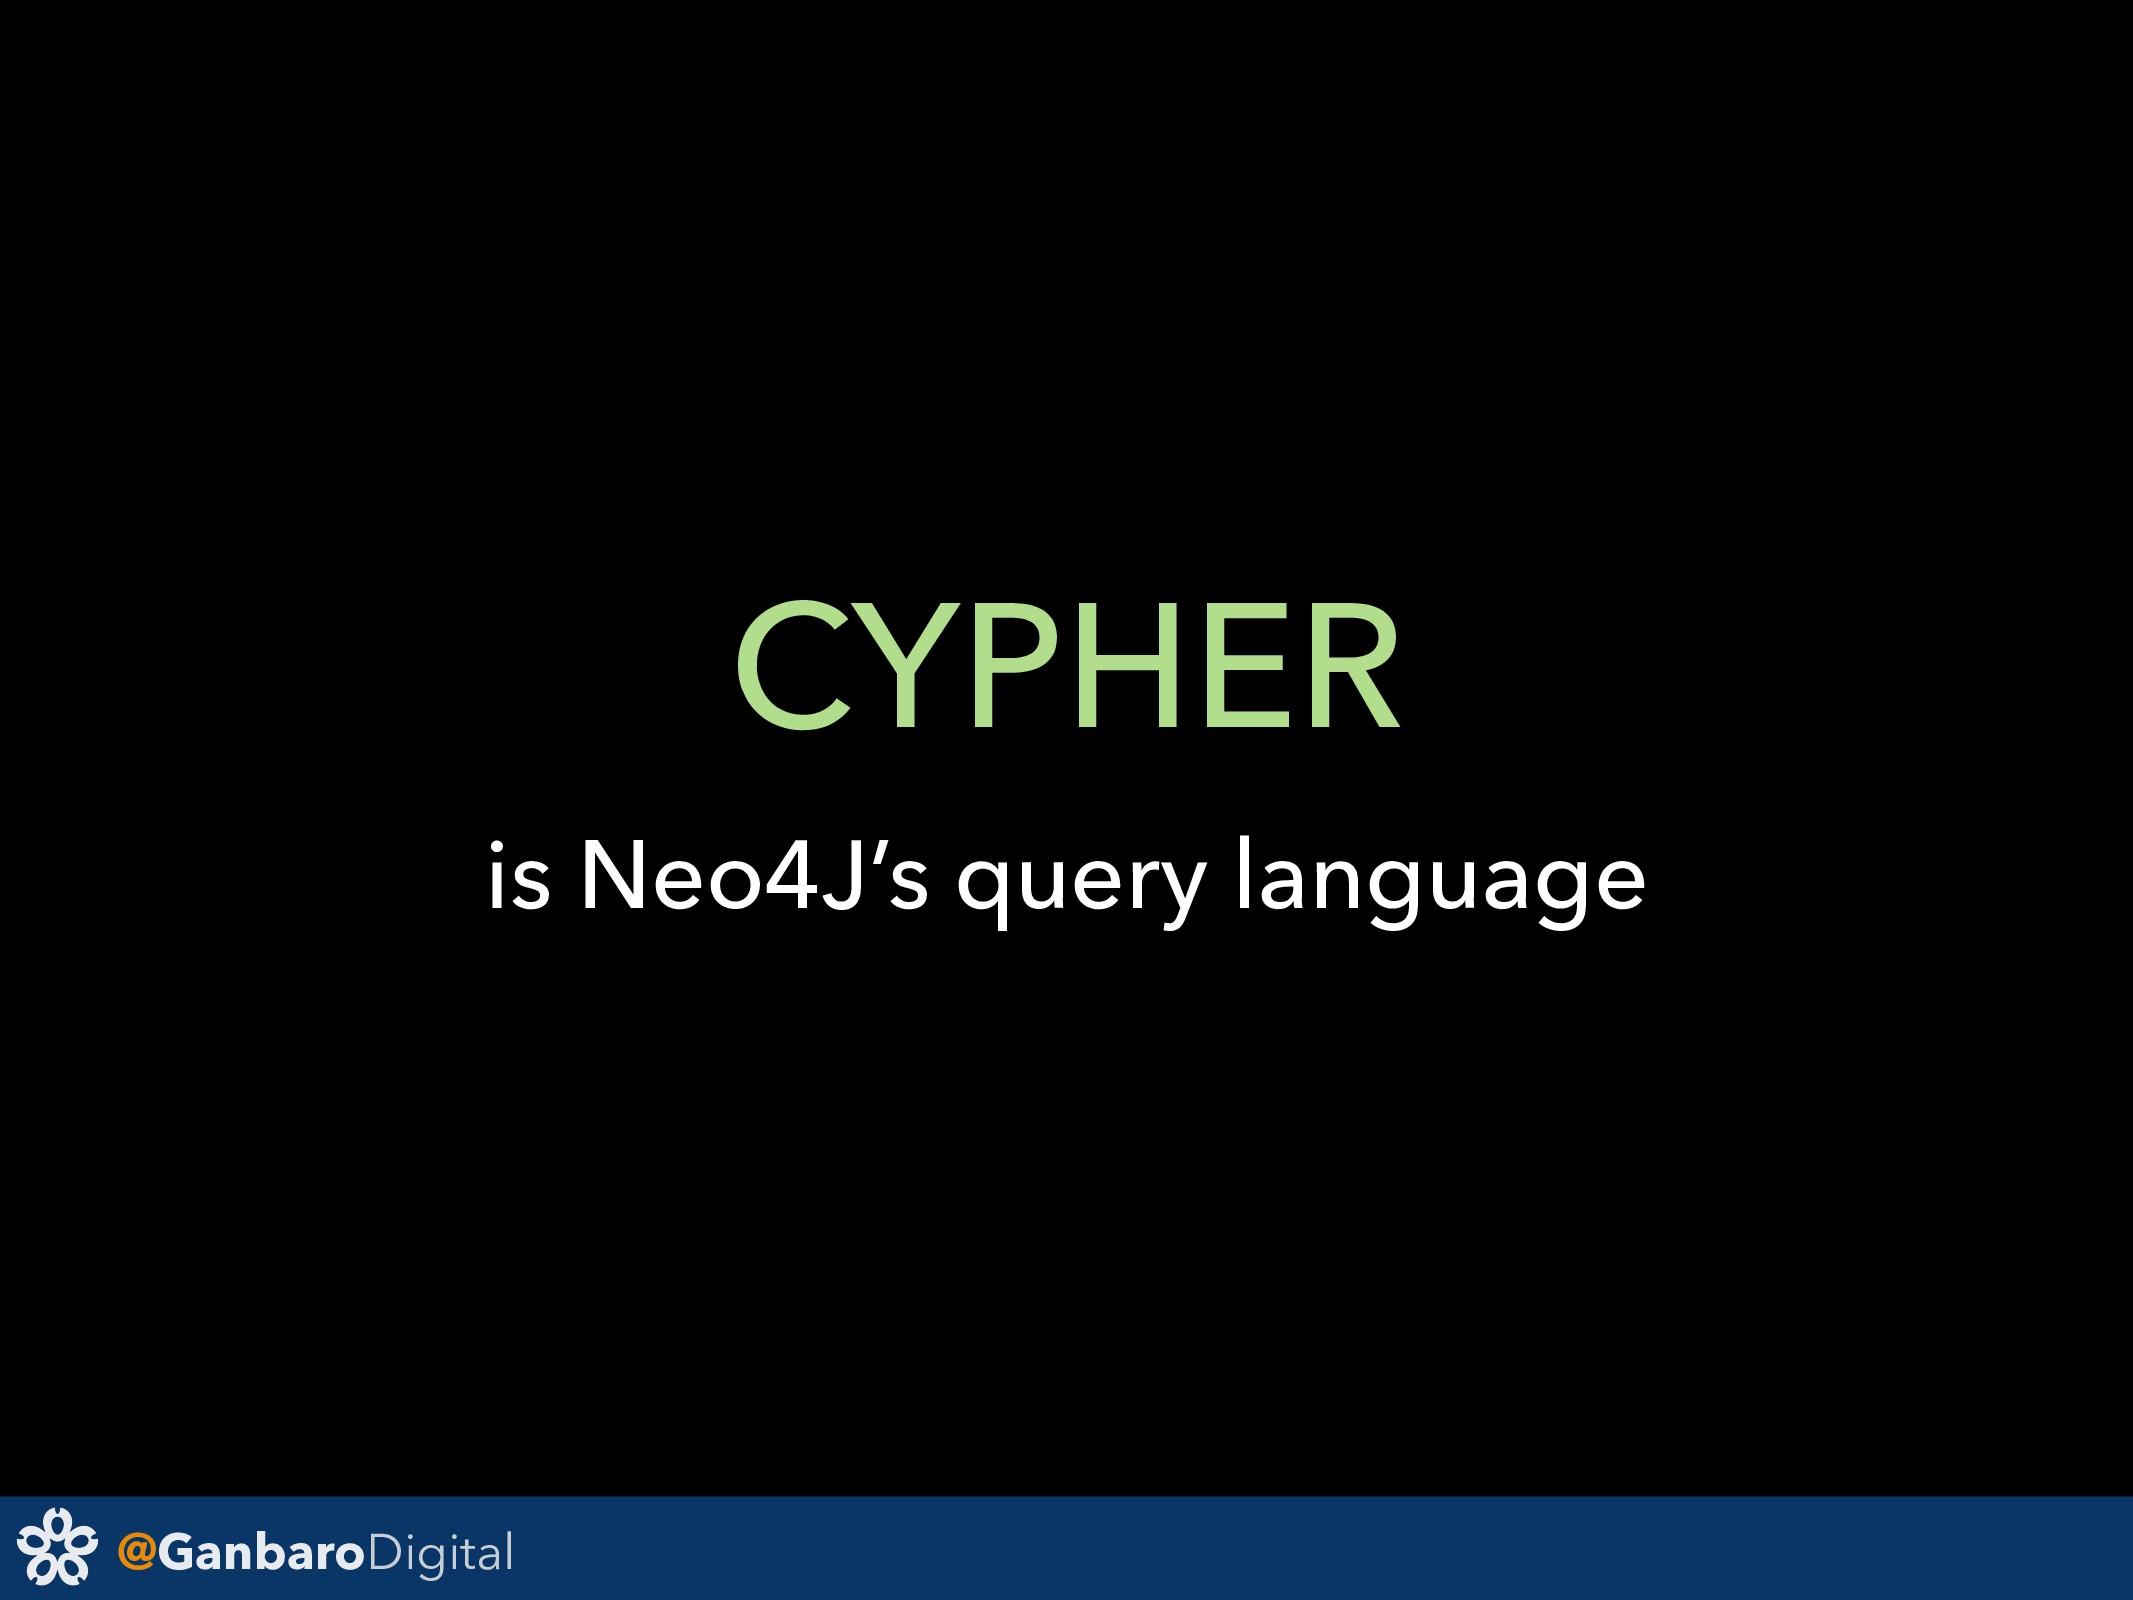 @GanbaroDigital CYPHER is Neo4J's query language